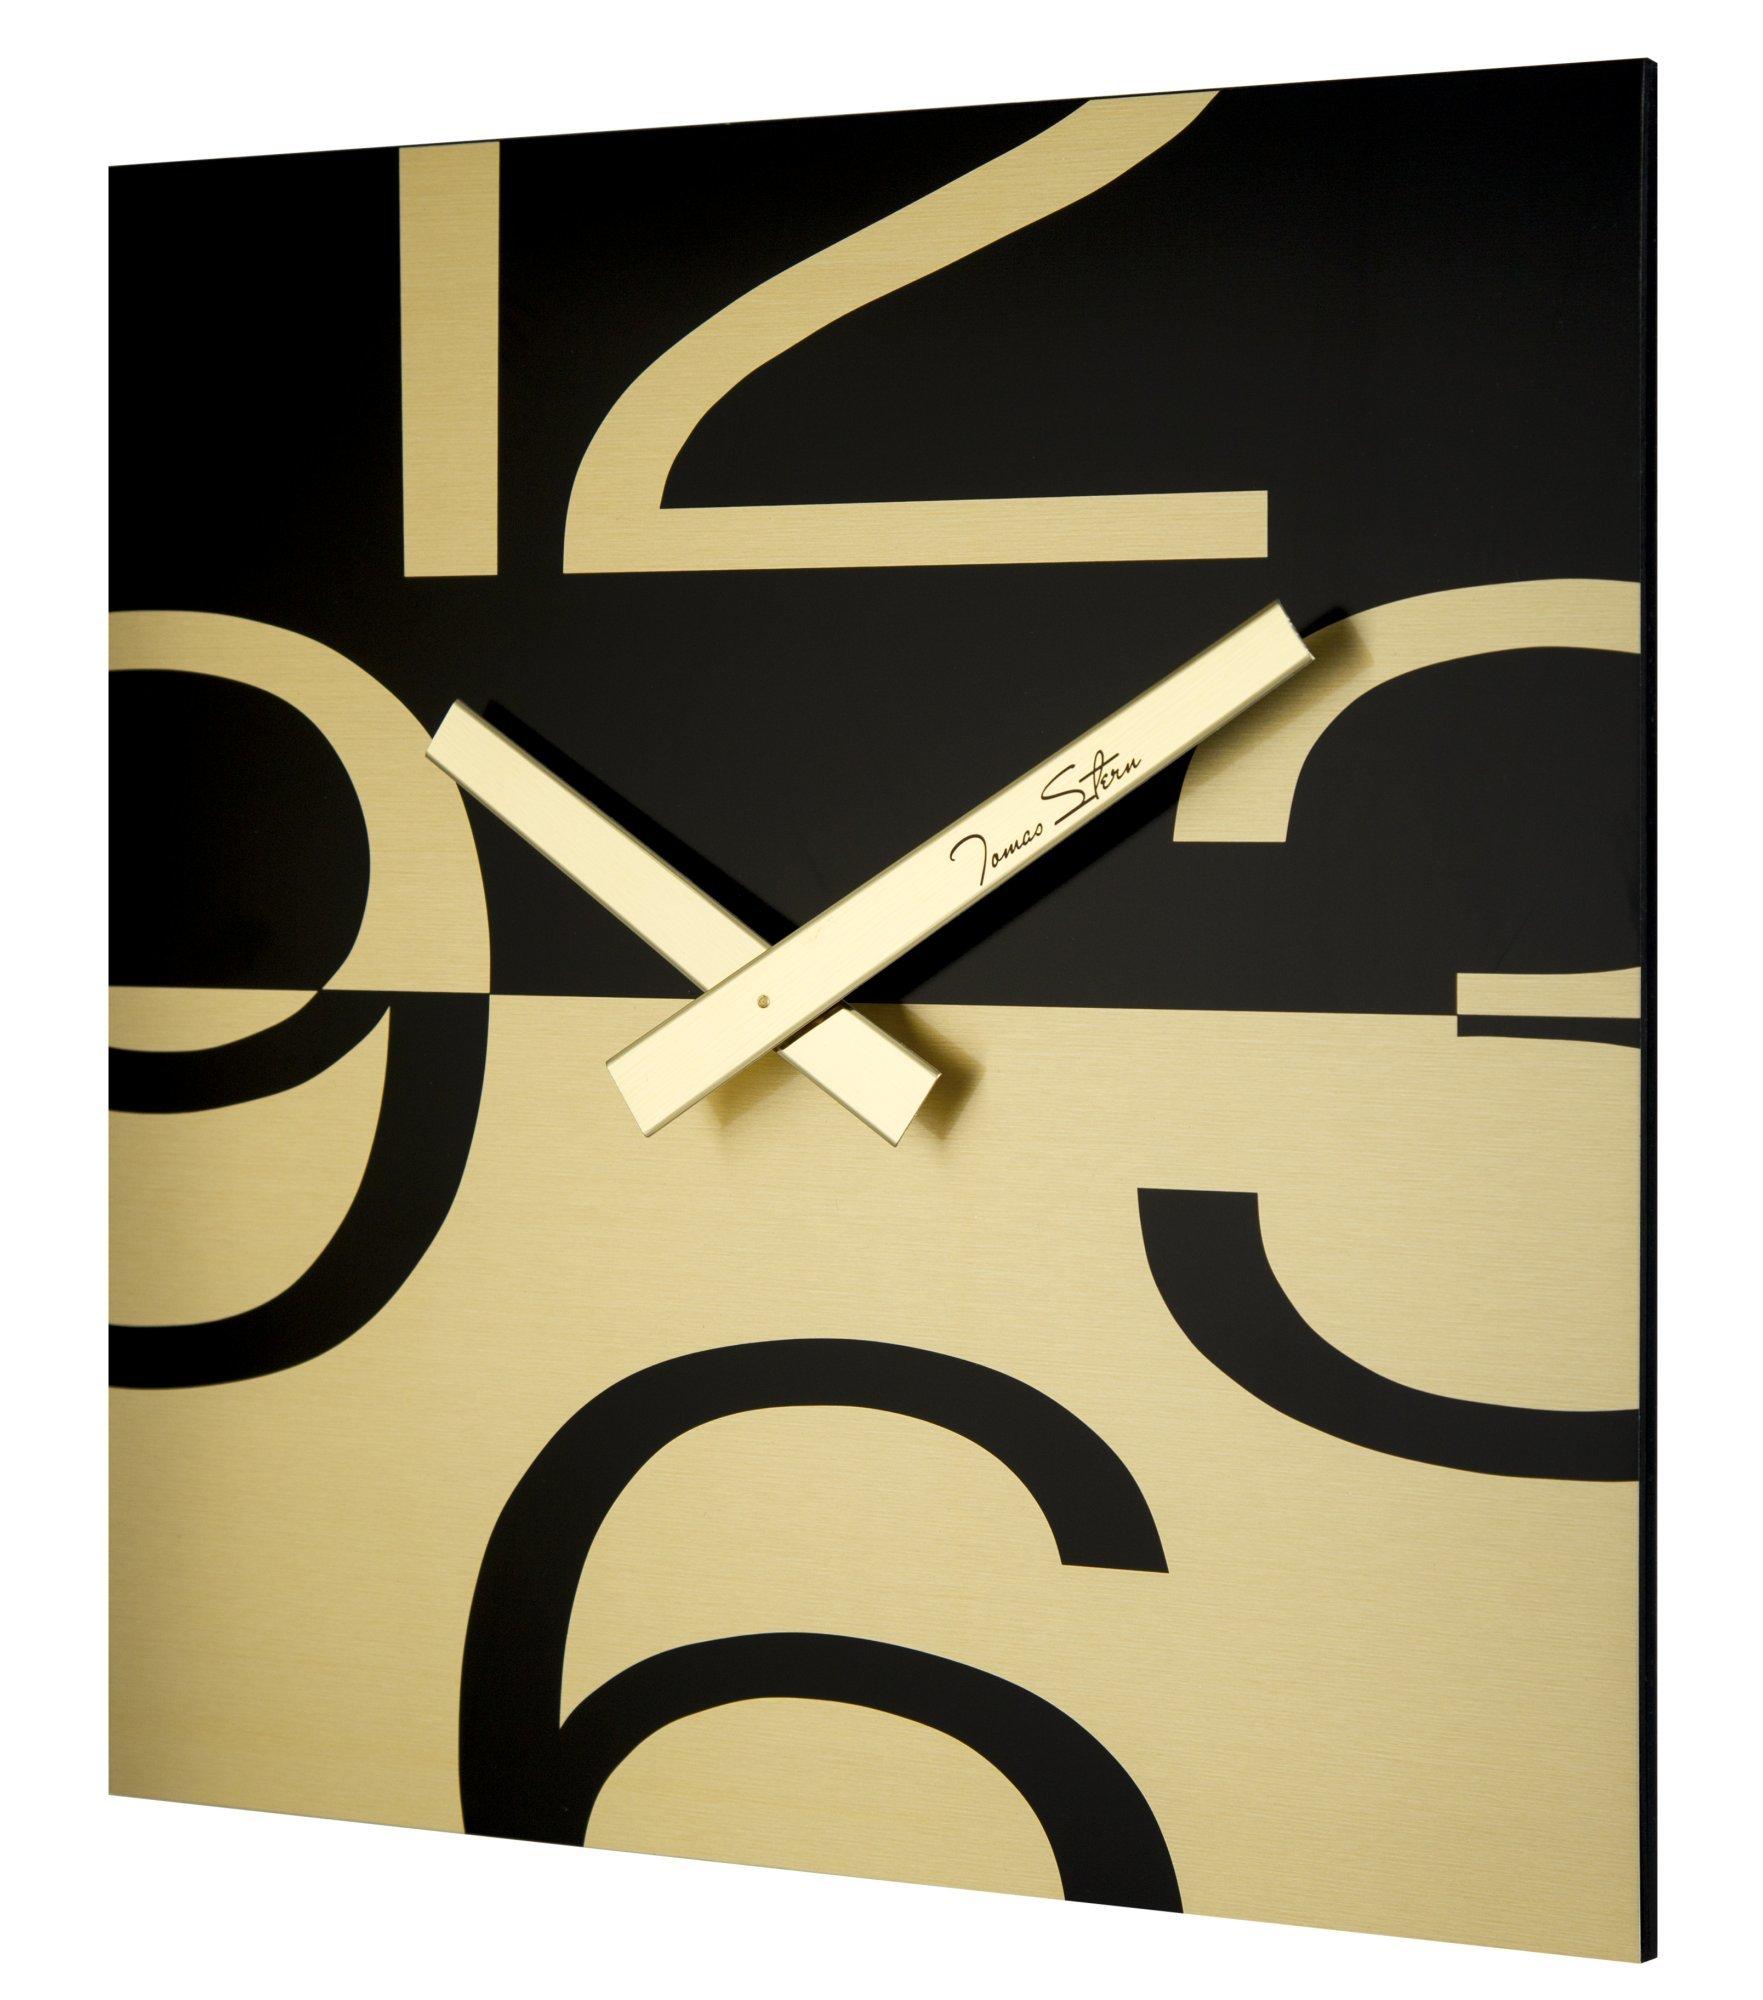 Часы настенные Часы настенные Tomas Stern 4019G chasy-nastennye-tomas-stern-4019g-germaniya.jpg